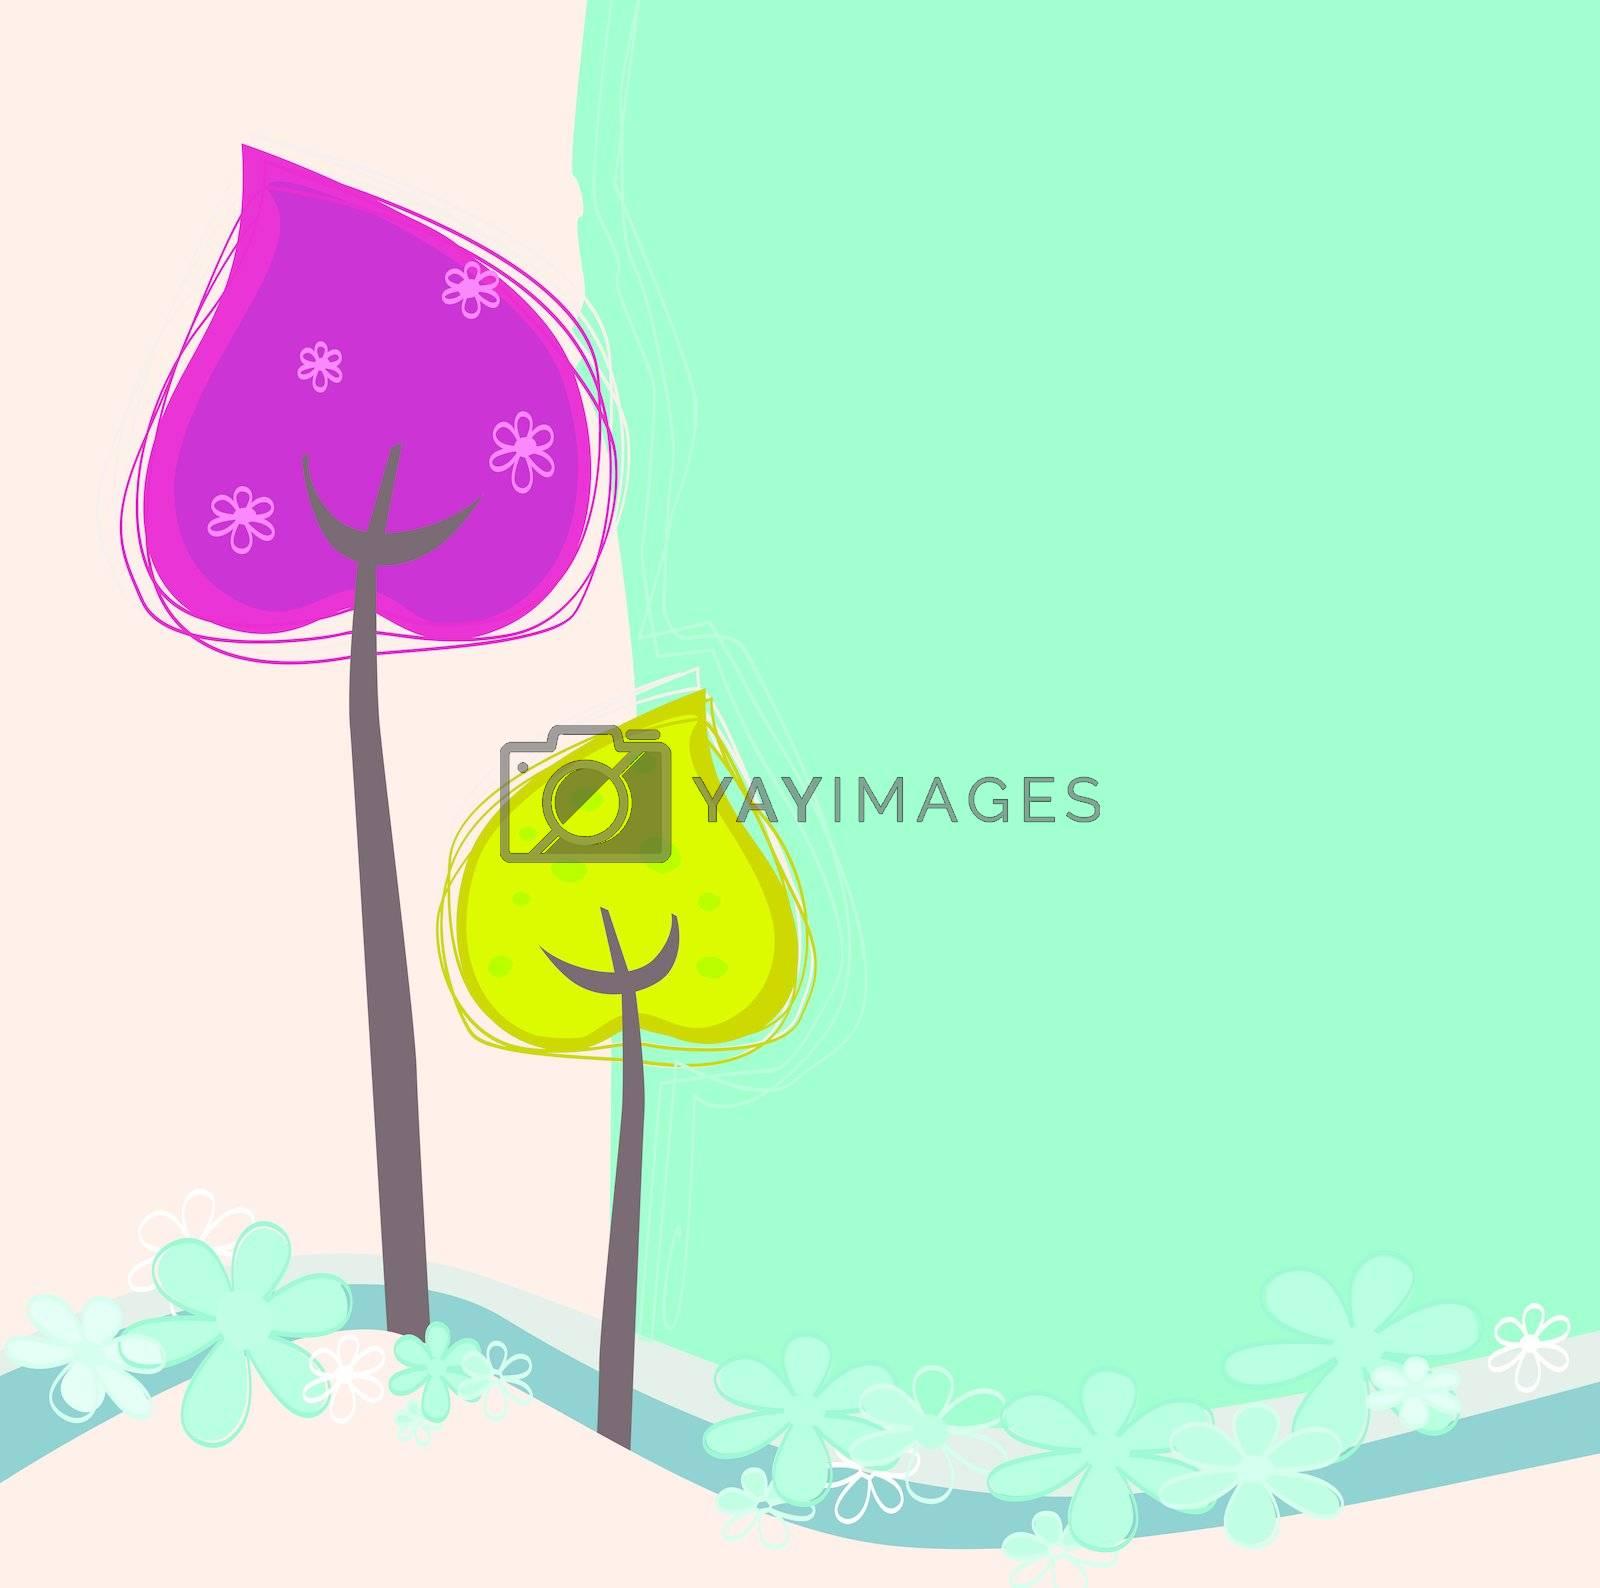 Retro background natural design with copyspace. See similar images in my portoflio!